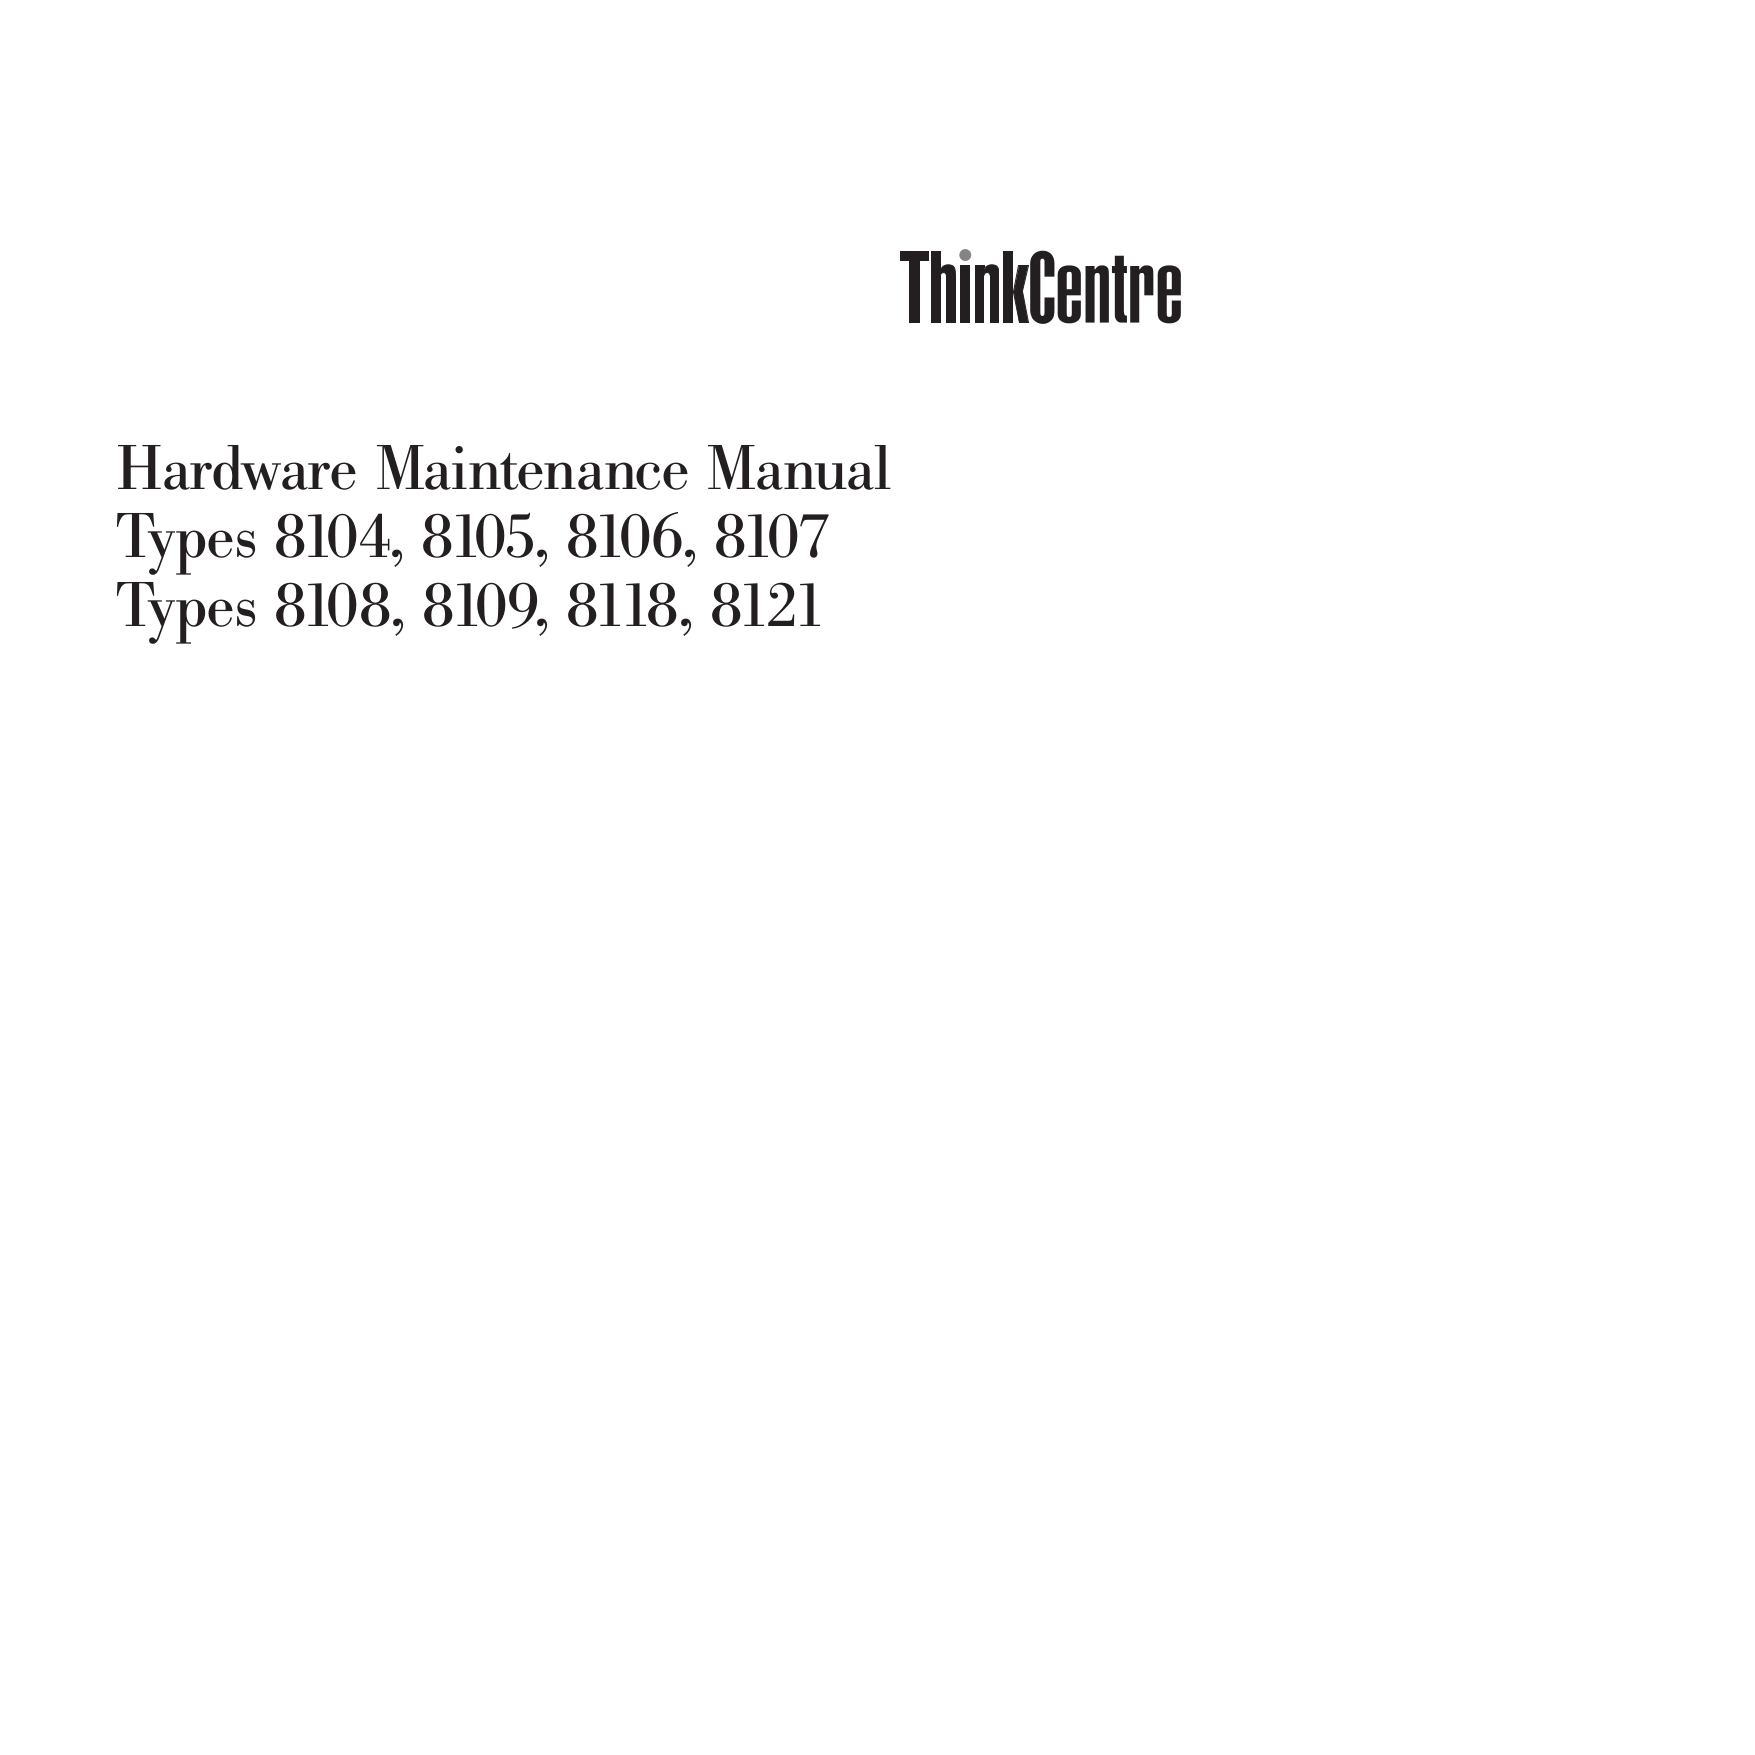 pdf for Lenovo Desktop ThinkCentre M51 8118 manual